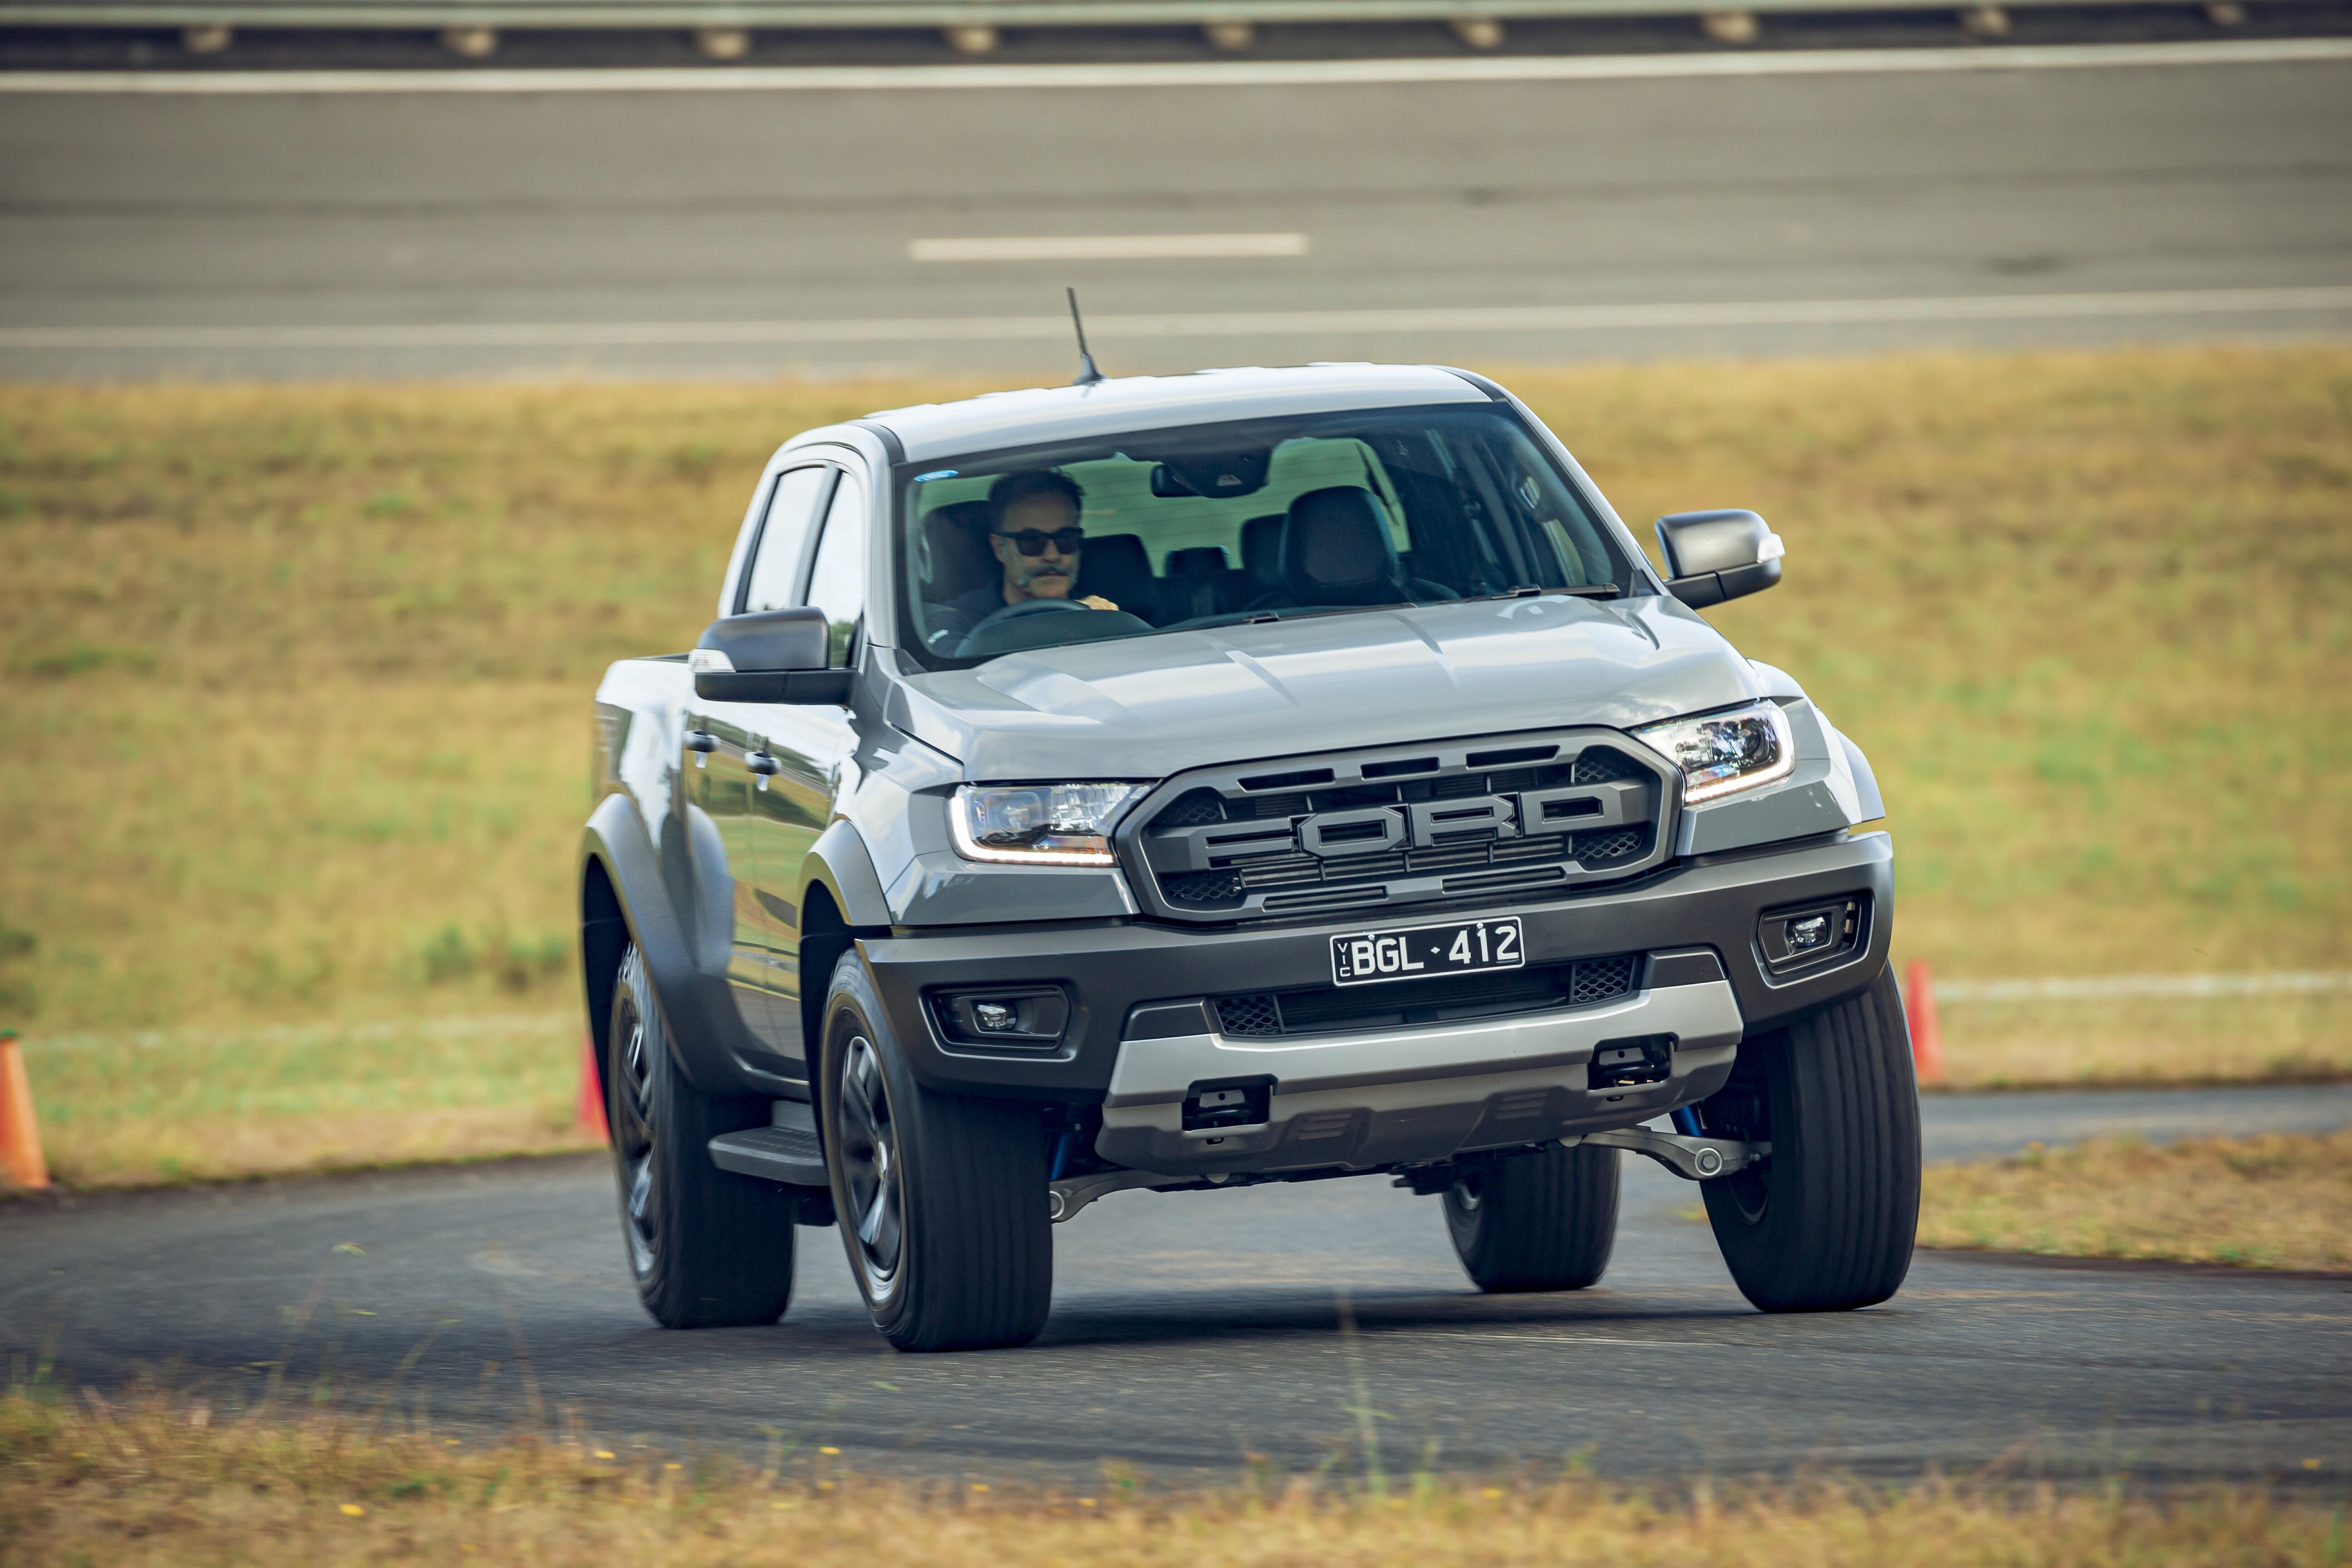 4 X 4 Australia Comparisons 2021 May 21 Ford Ranger Raptor Handling